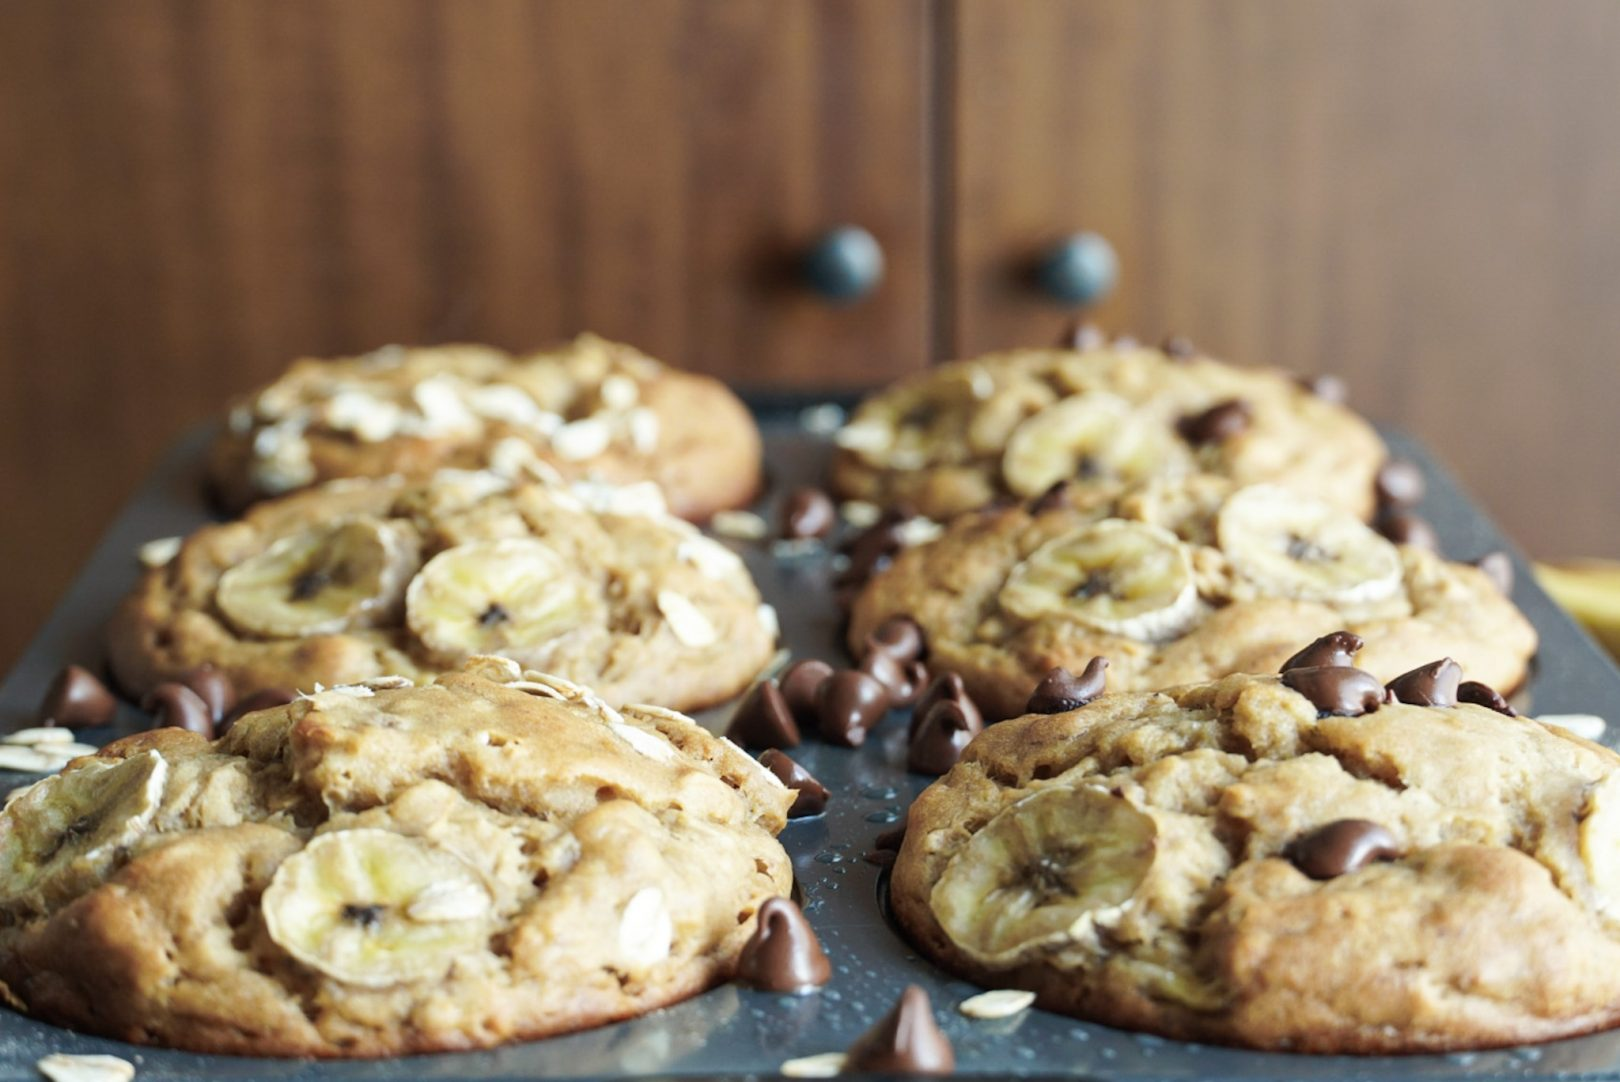 Muffins jumbo bananes et érable